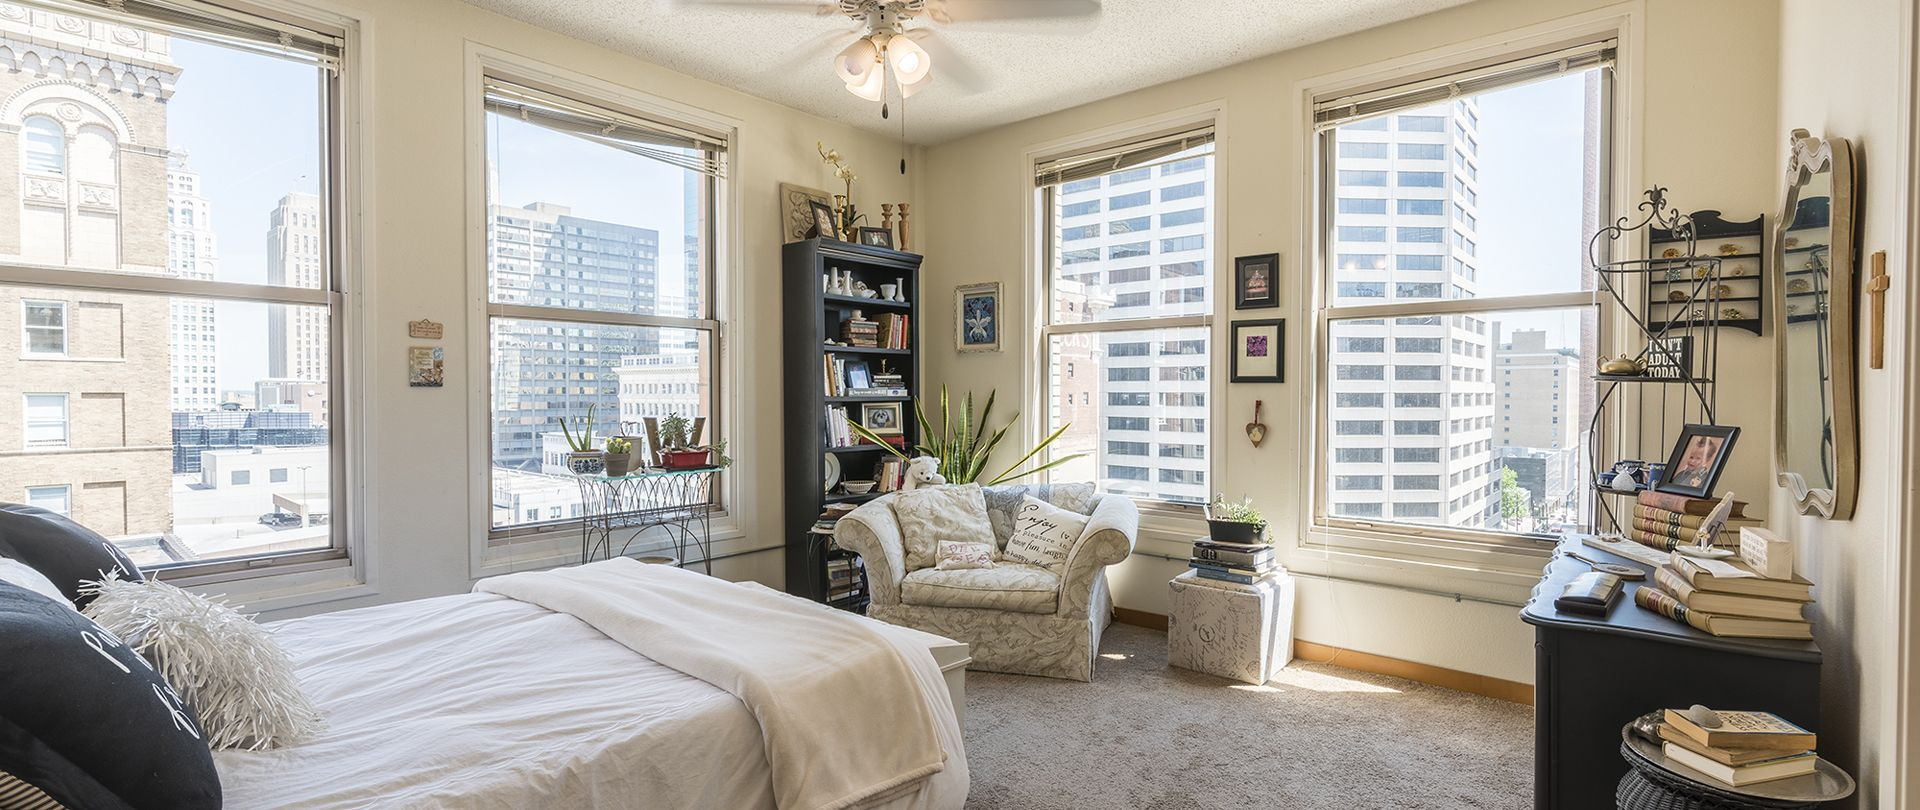 Library Lofts Kansas City Lofts Condos And Apartments Kcloftcentral Apartment Loft Loft Apartment